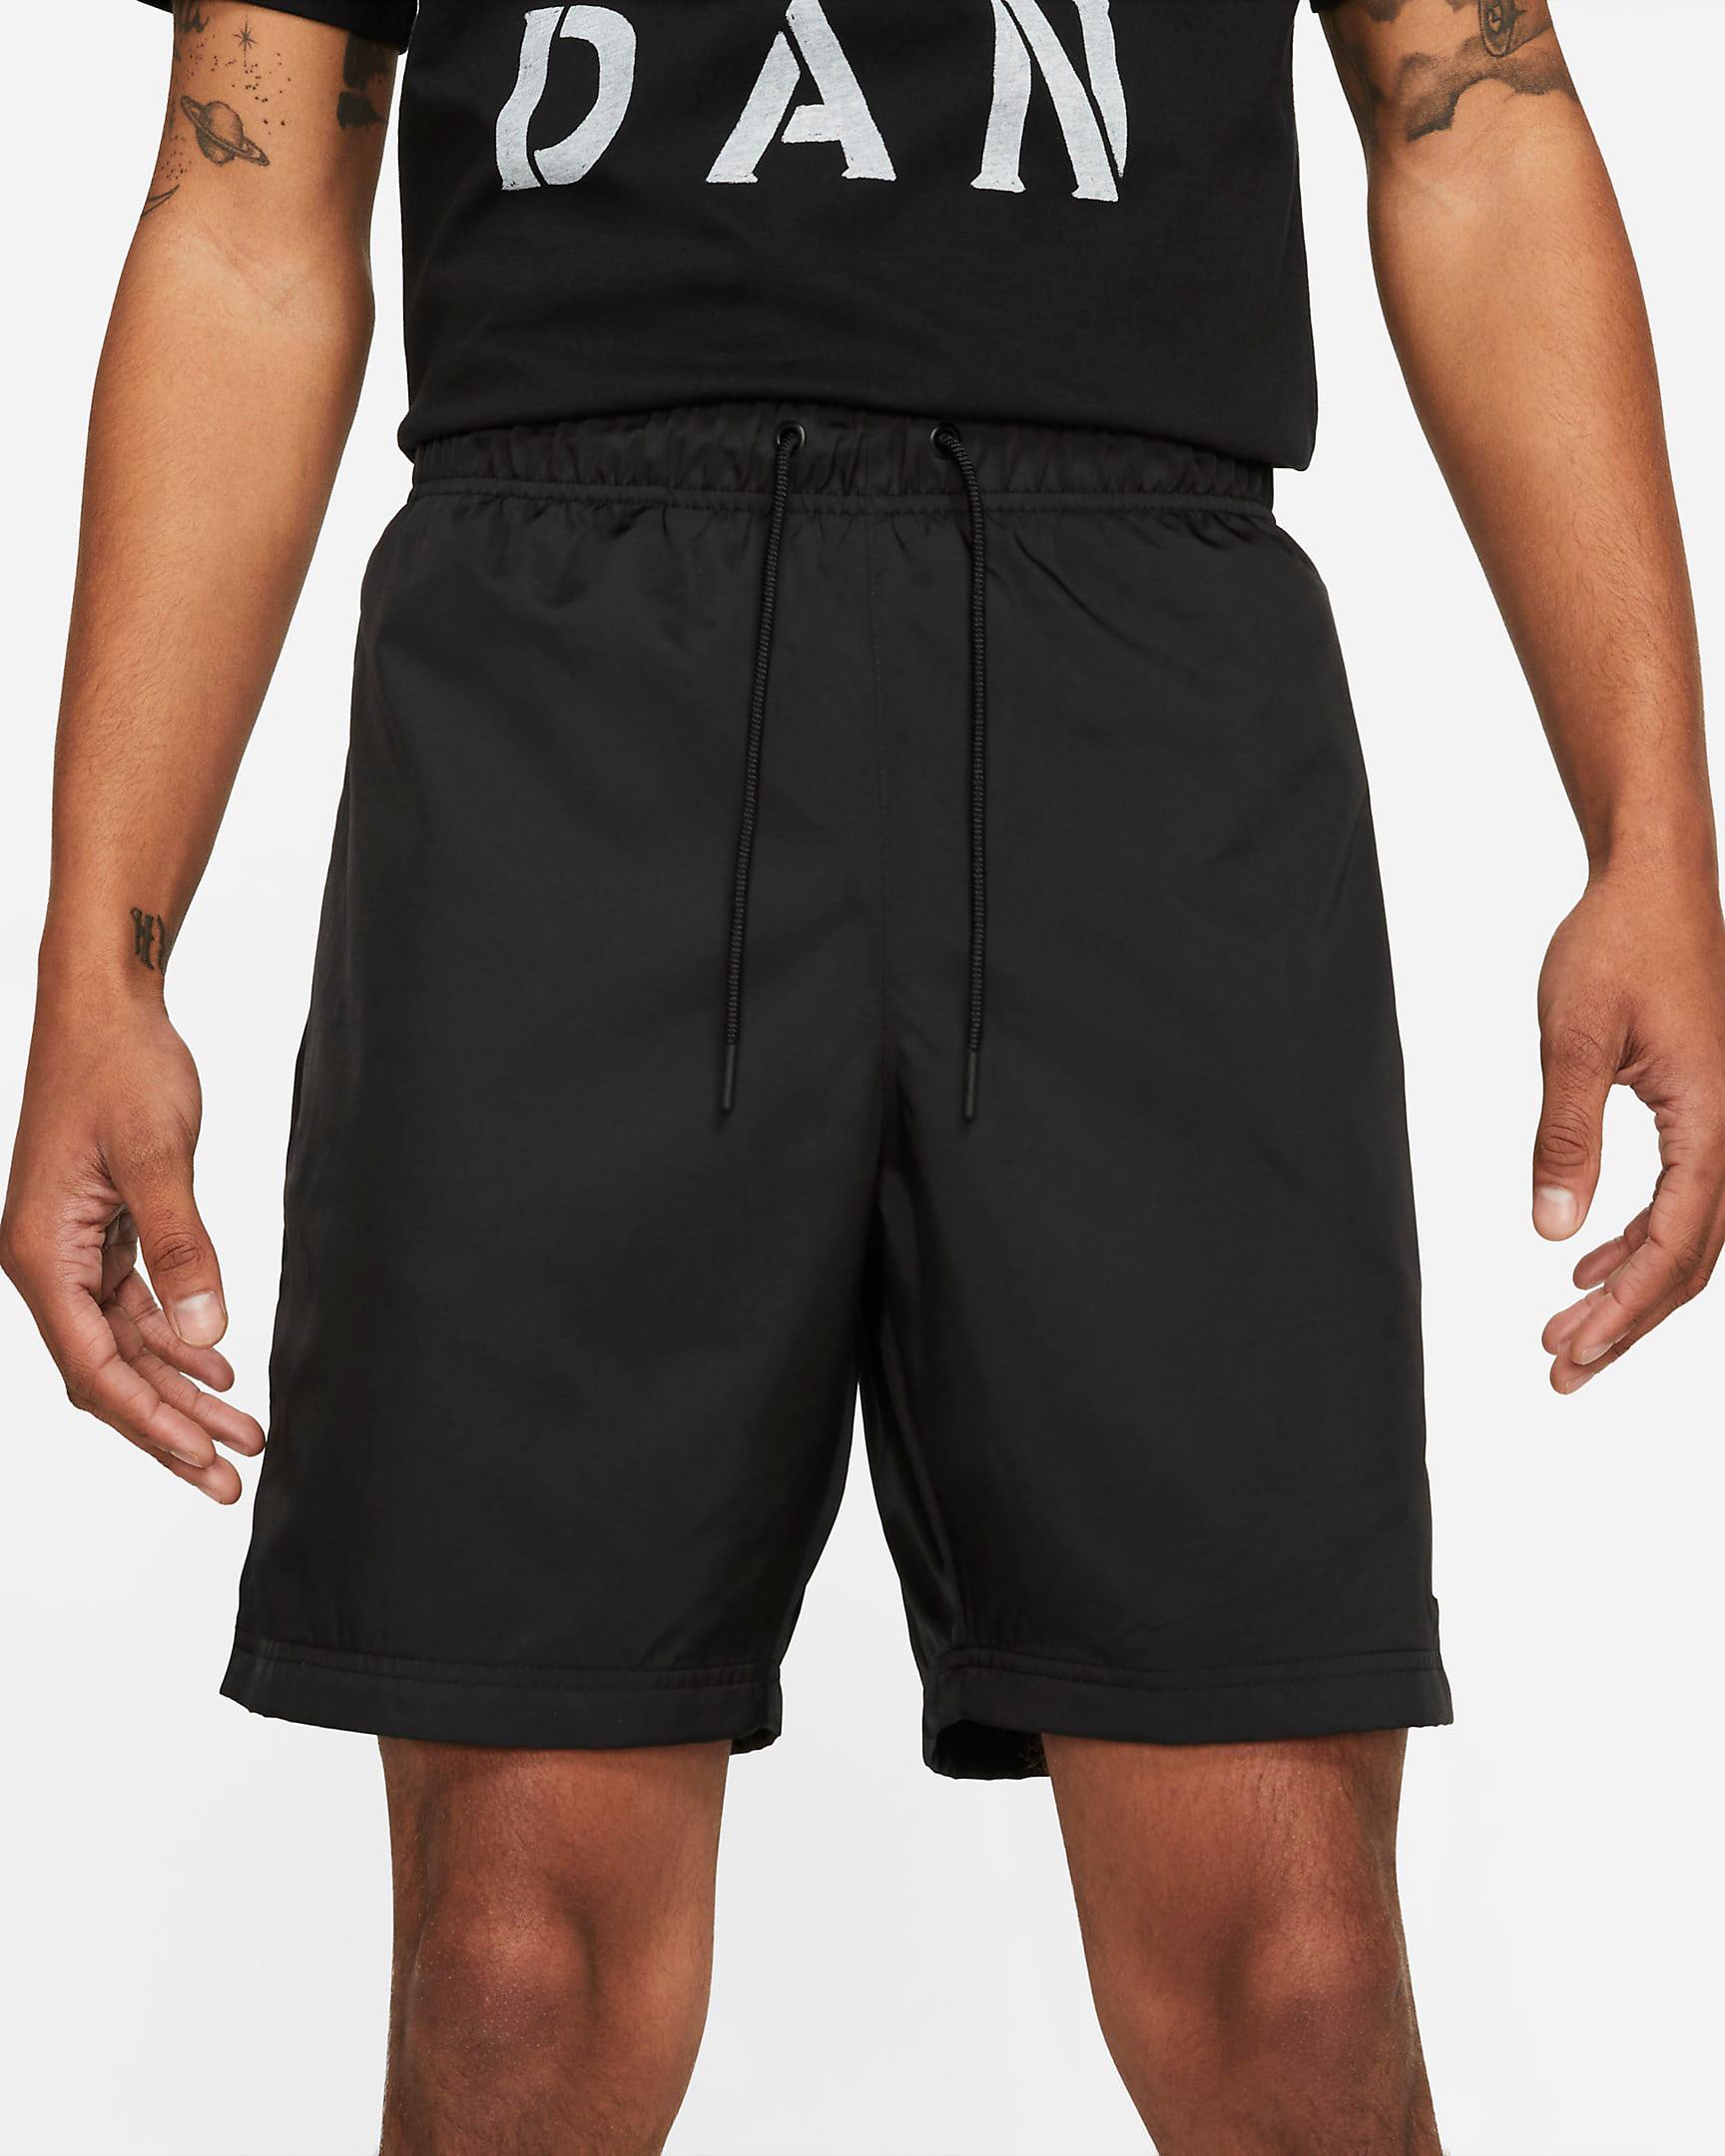 jordan-jumpman-poolside-shorts-black-white-1